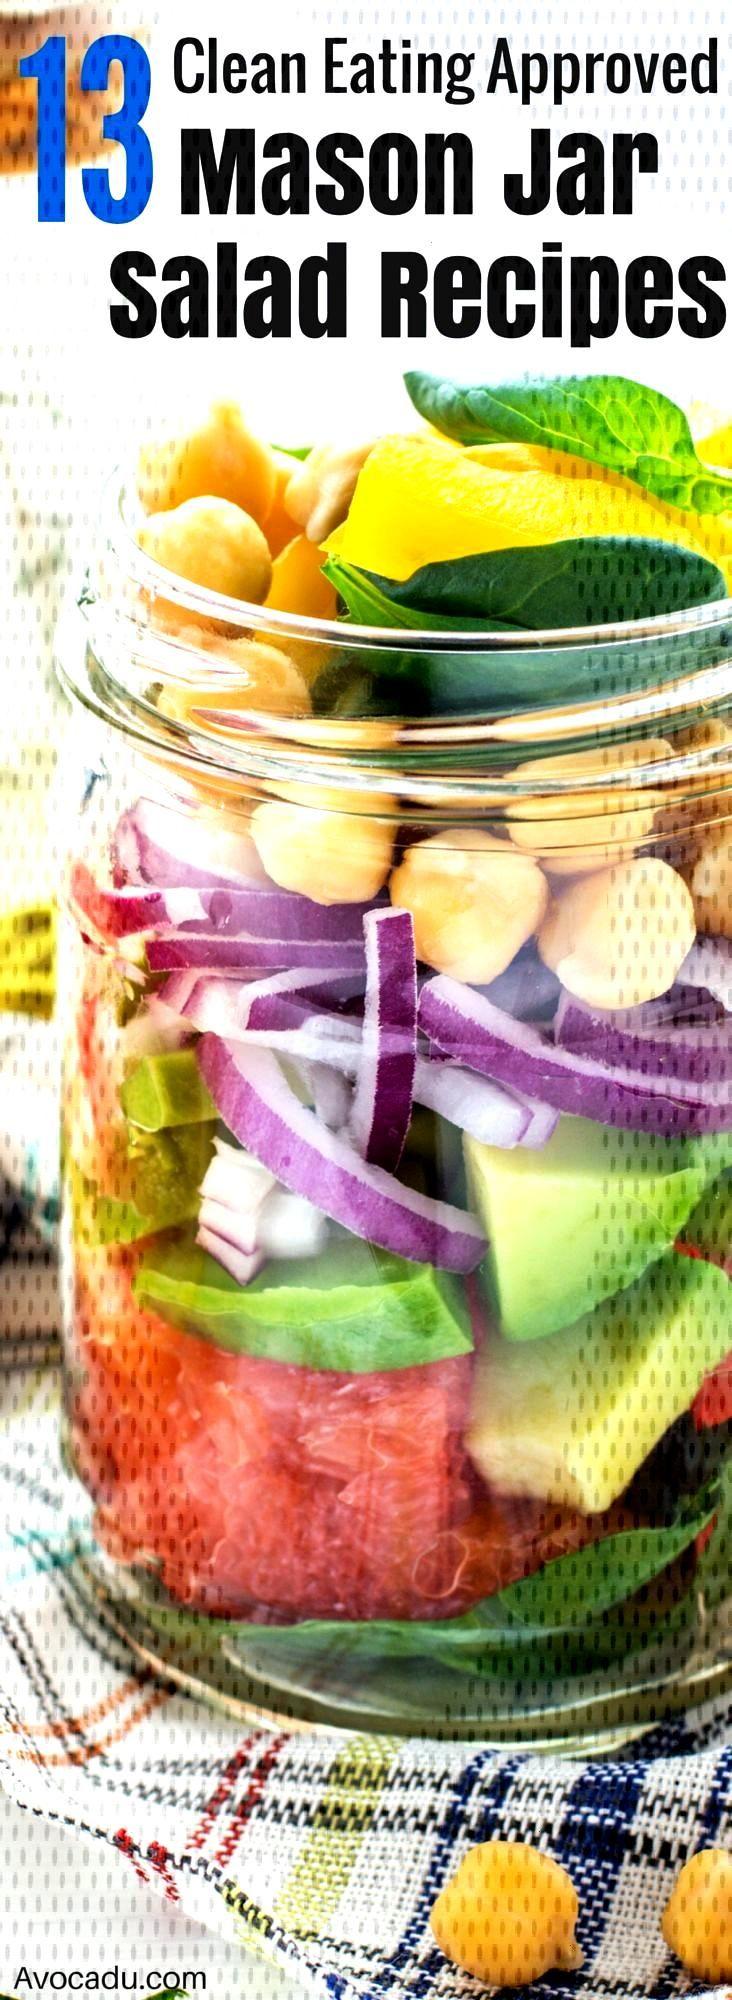 13 Mason Jar Salads That Make Perfect Healthy Lunches, 13 Mason Jar Salads That Make Perfect Healt